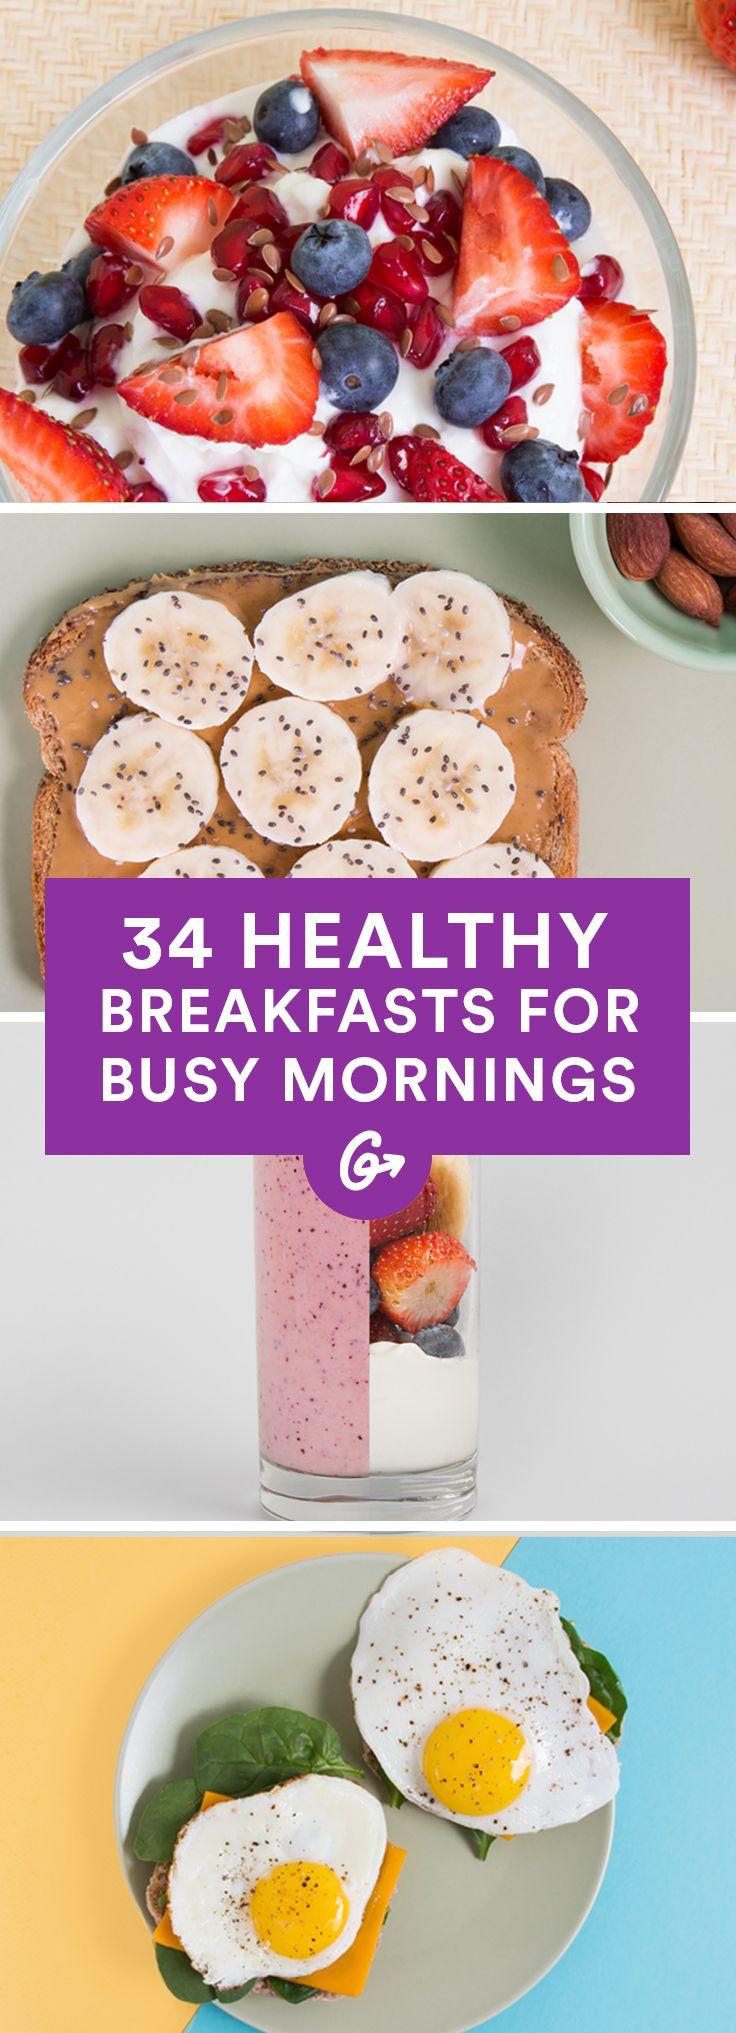 Fast Food Healthy Breakfast  39 Healthy Breakfasts for Busy Mornings